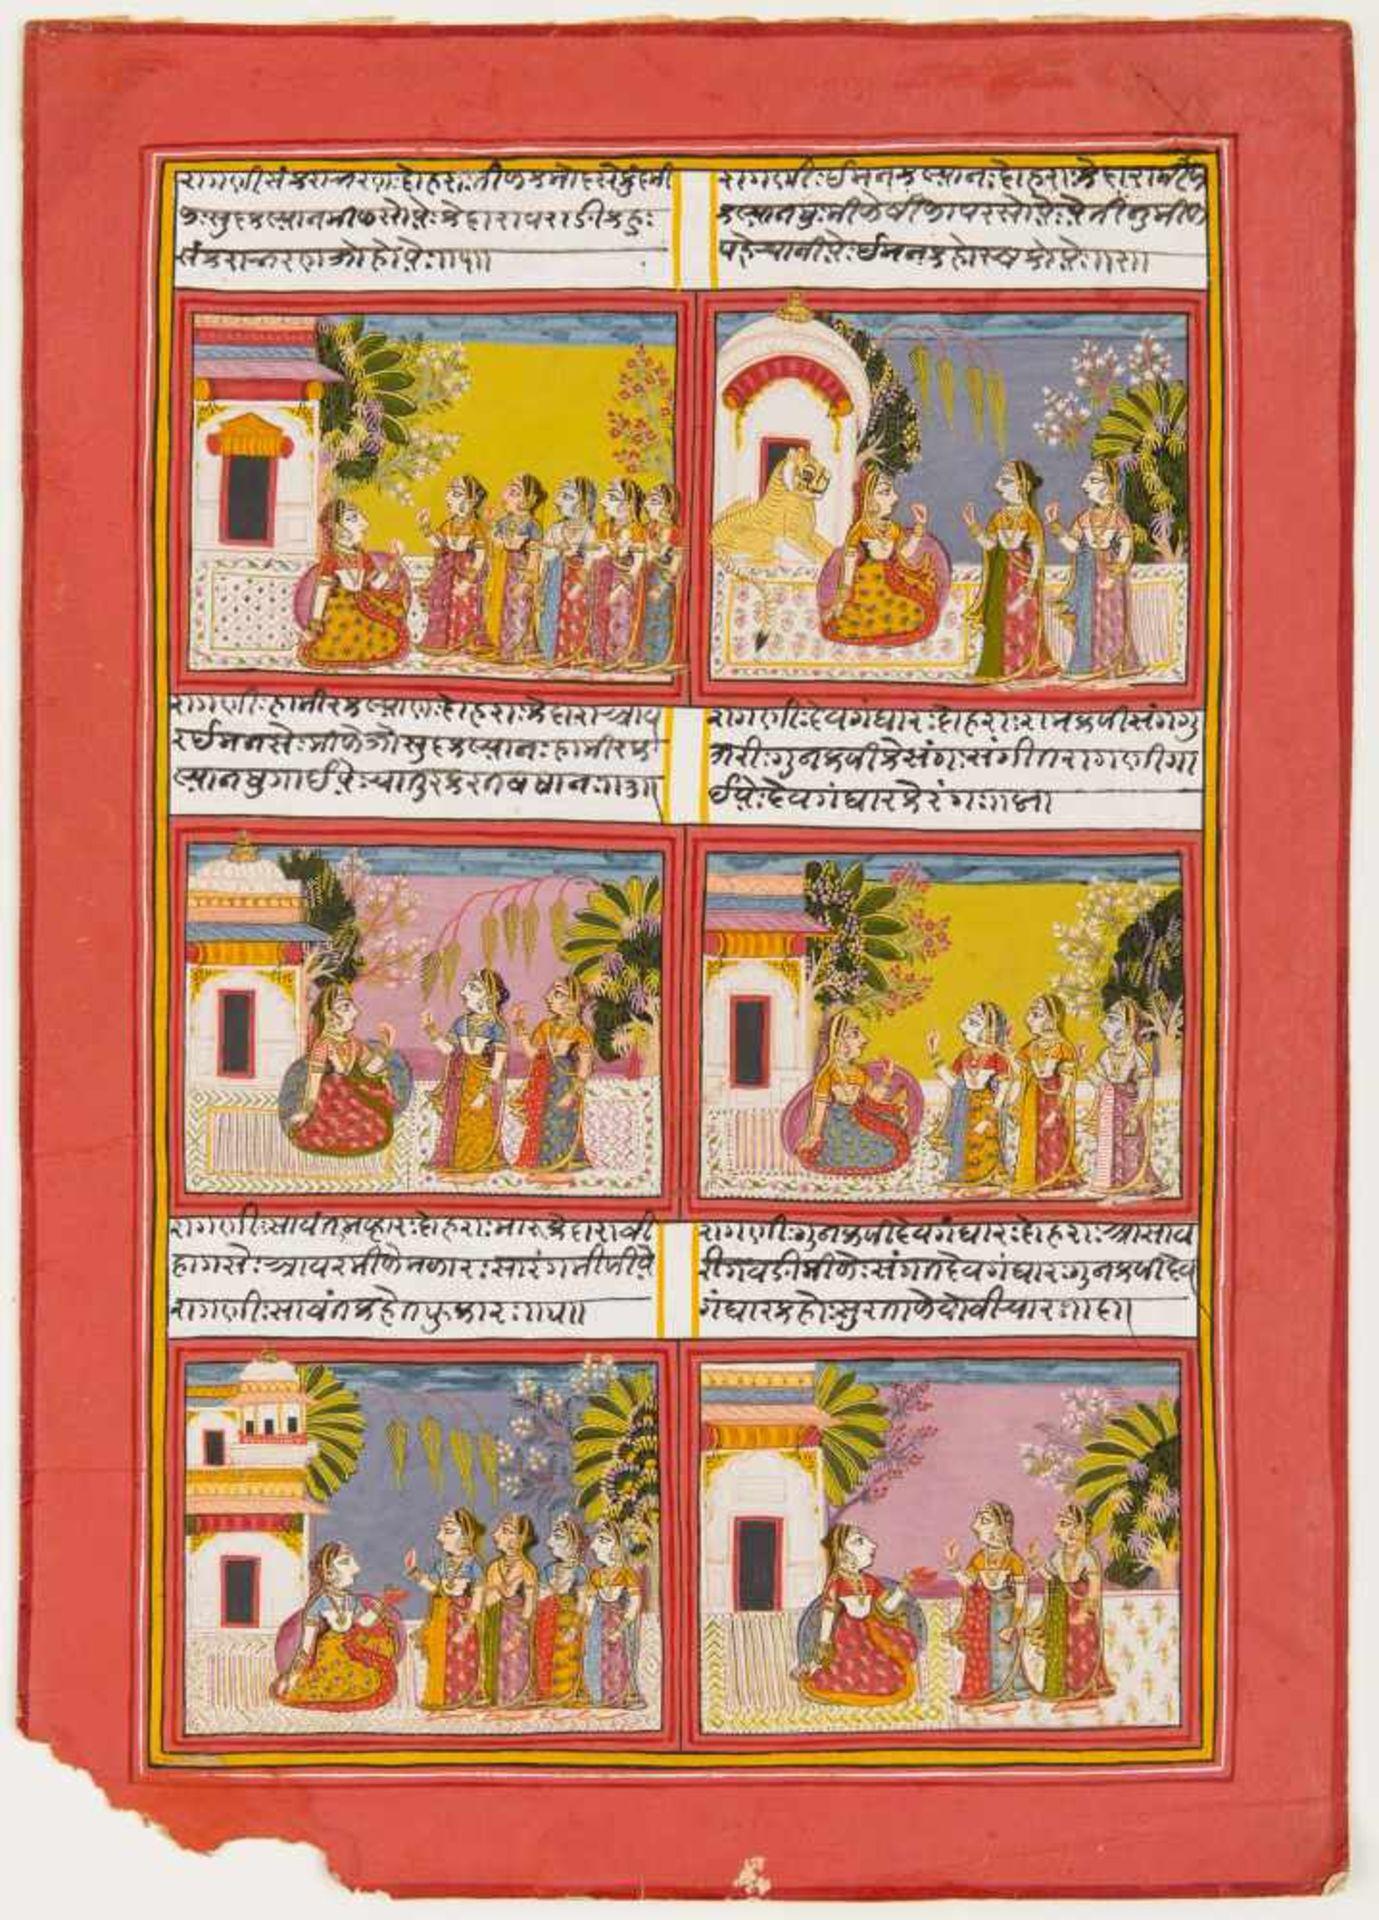 NOBLE LADIES - INDIAN MINIATURE PAINTING - AROUND 1800Indian Miniature Painting, colours and gold